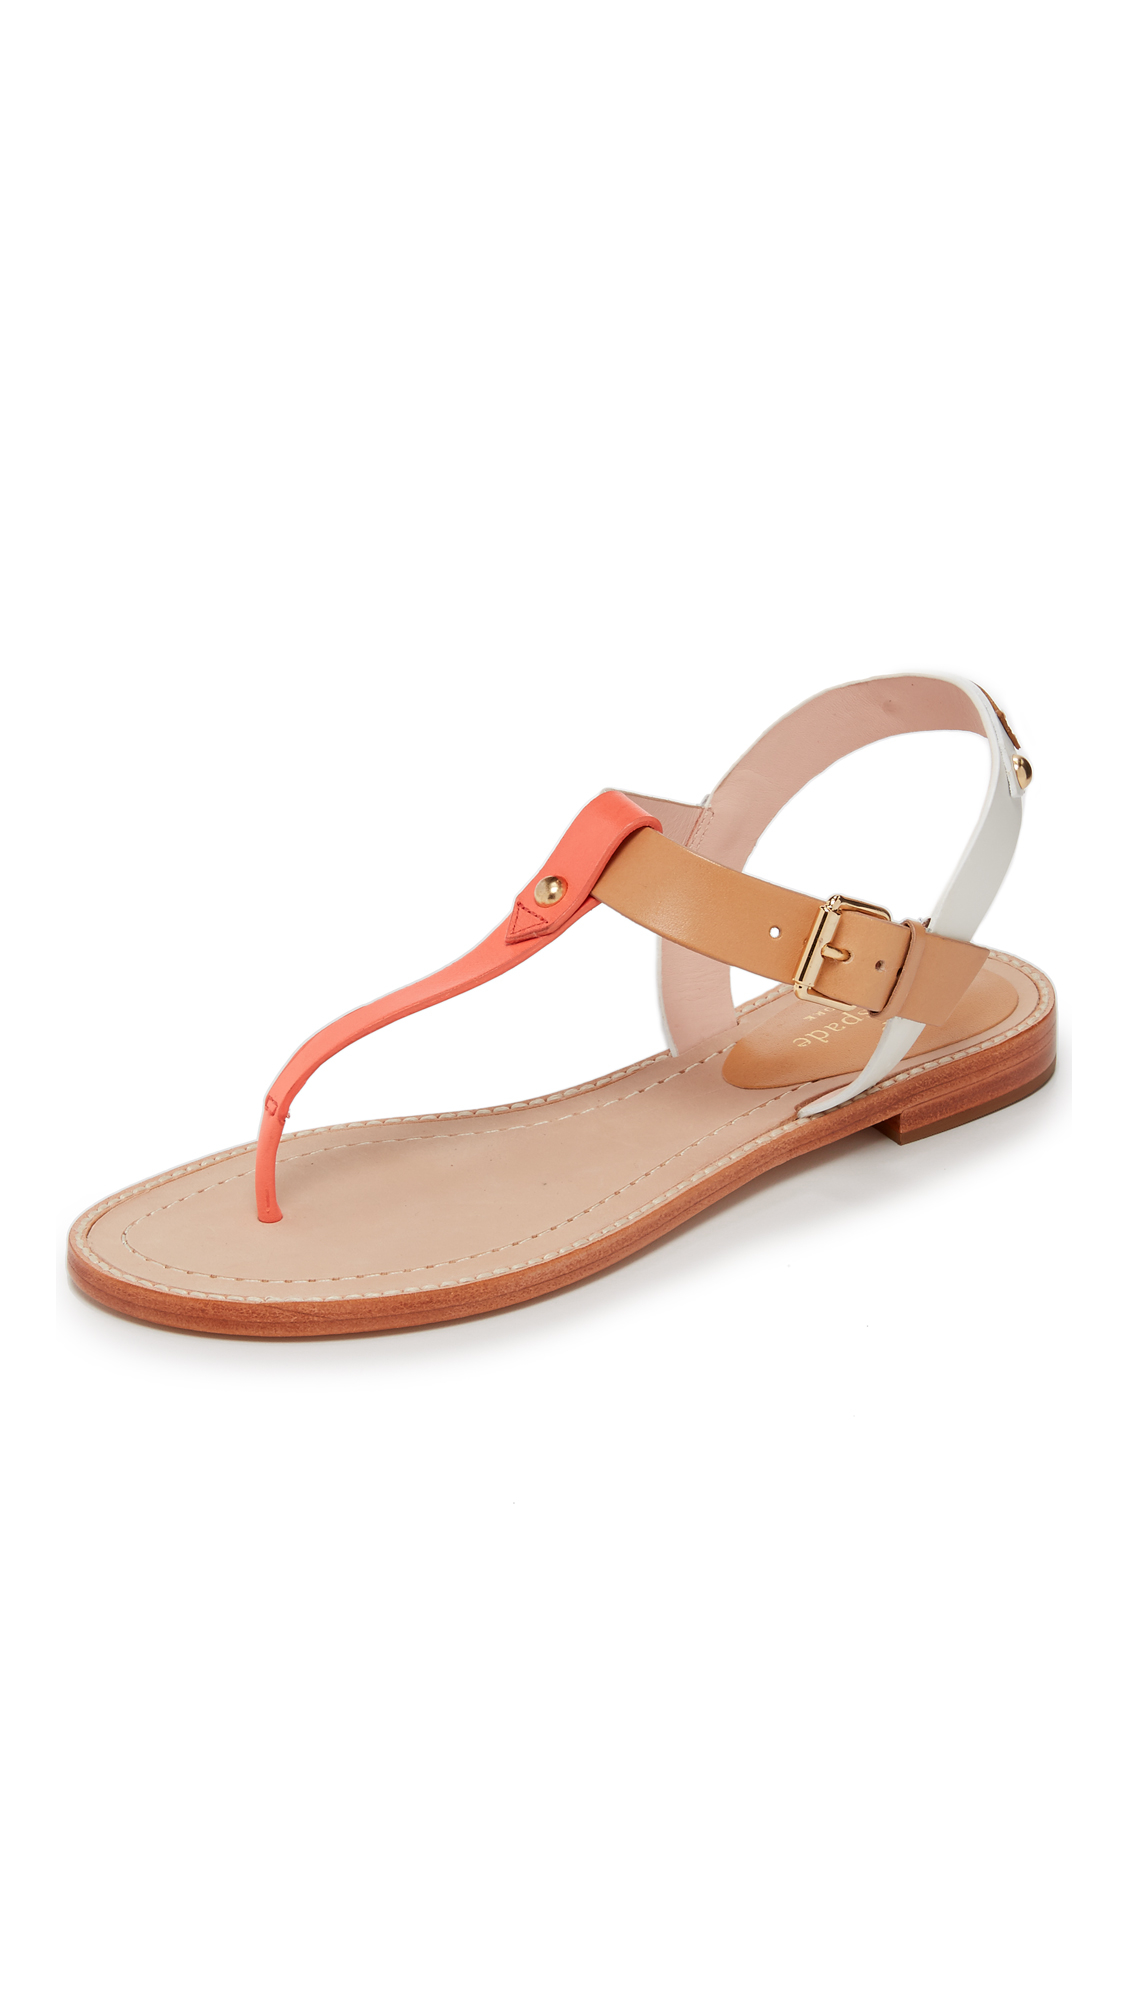 Lyst Kate Spade Sky Thong Sandals In Orange